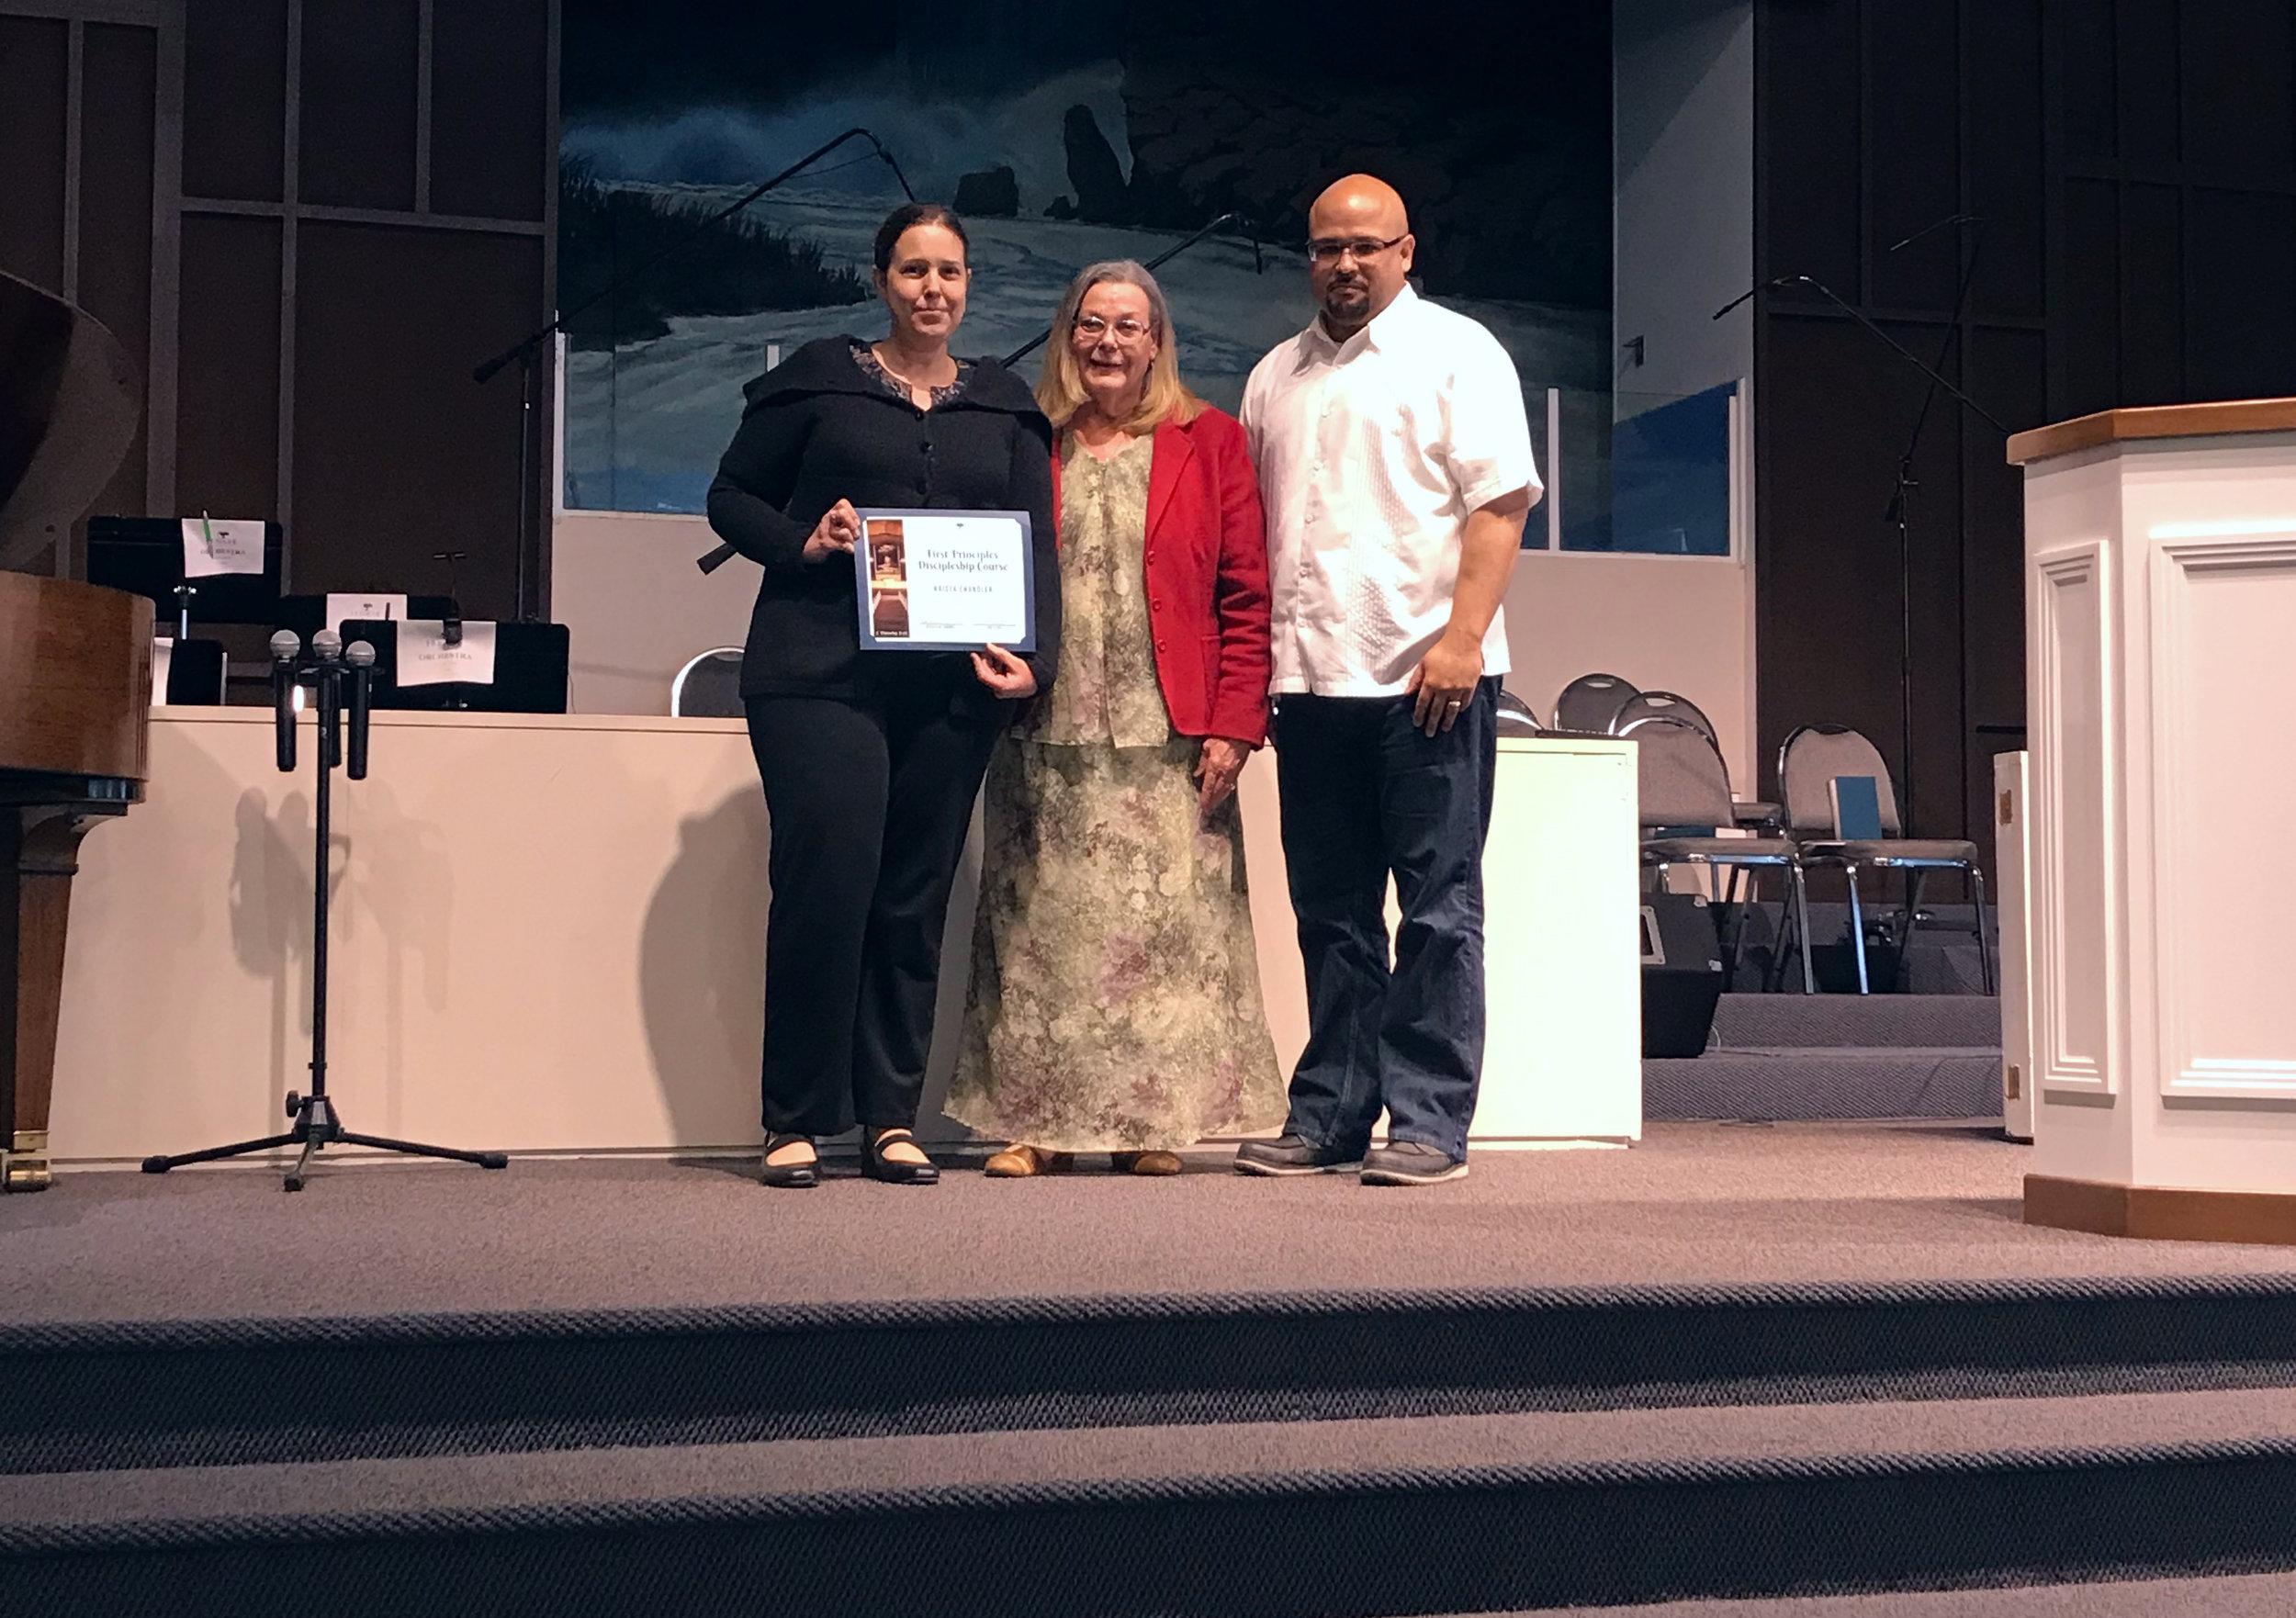 Congratulations - Krista!